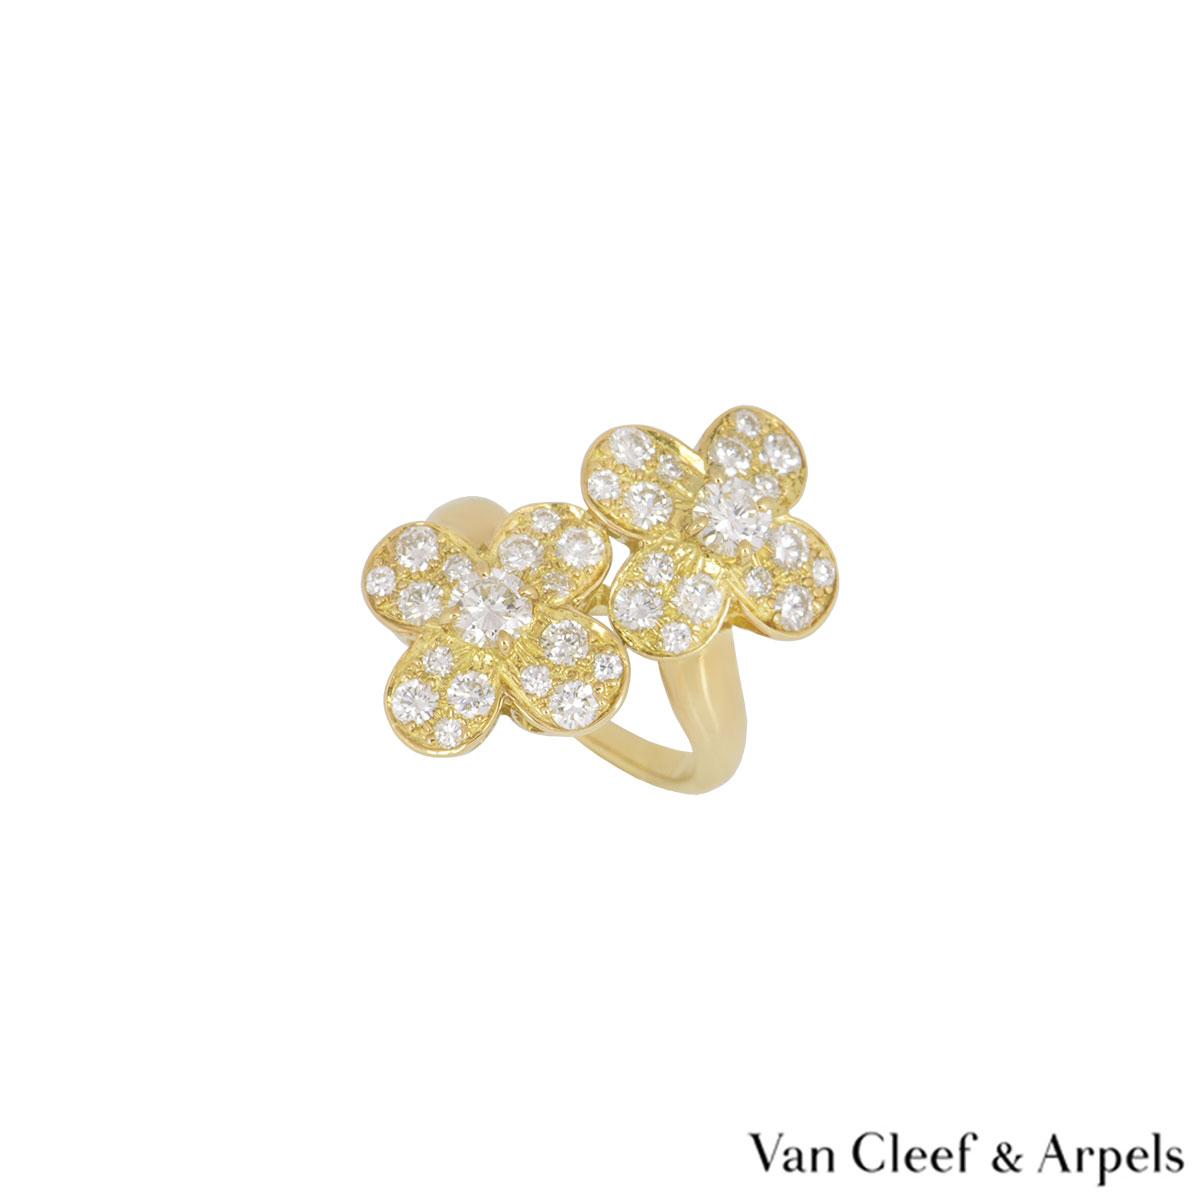 Van Cleef & Arpels Yellow Gold Diamond Trefle Ring